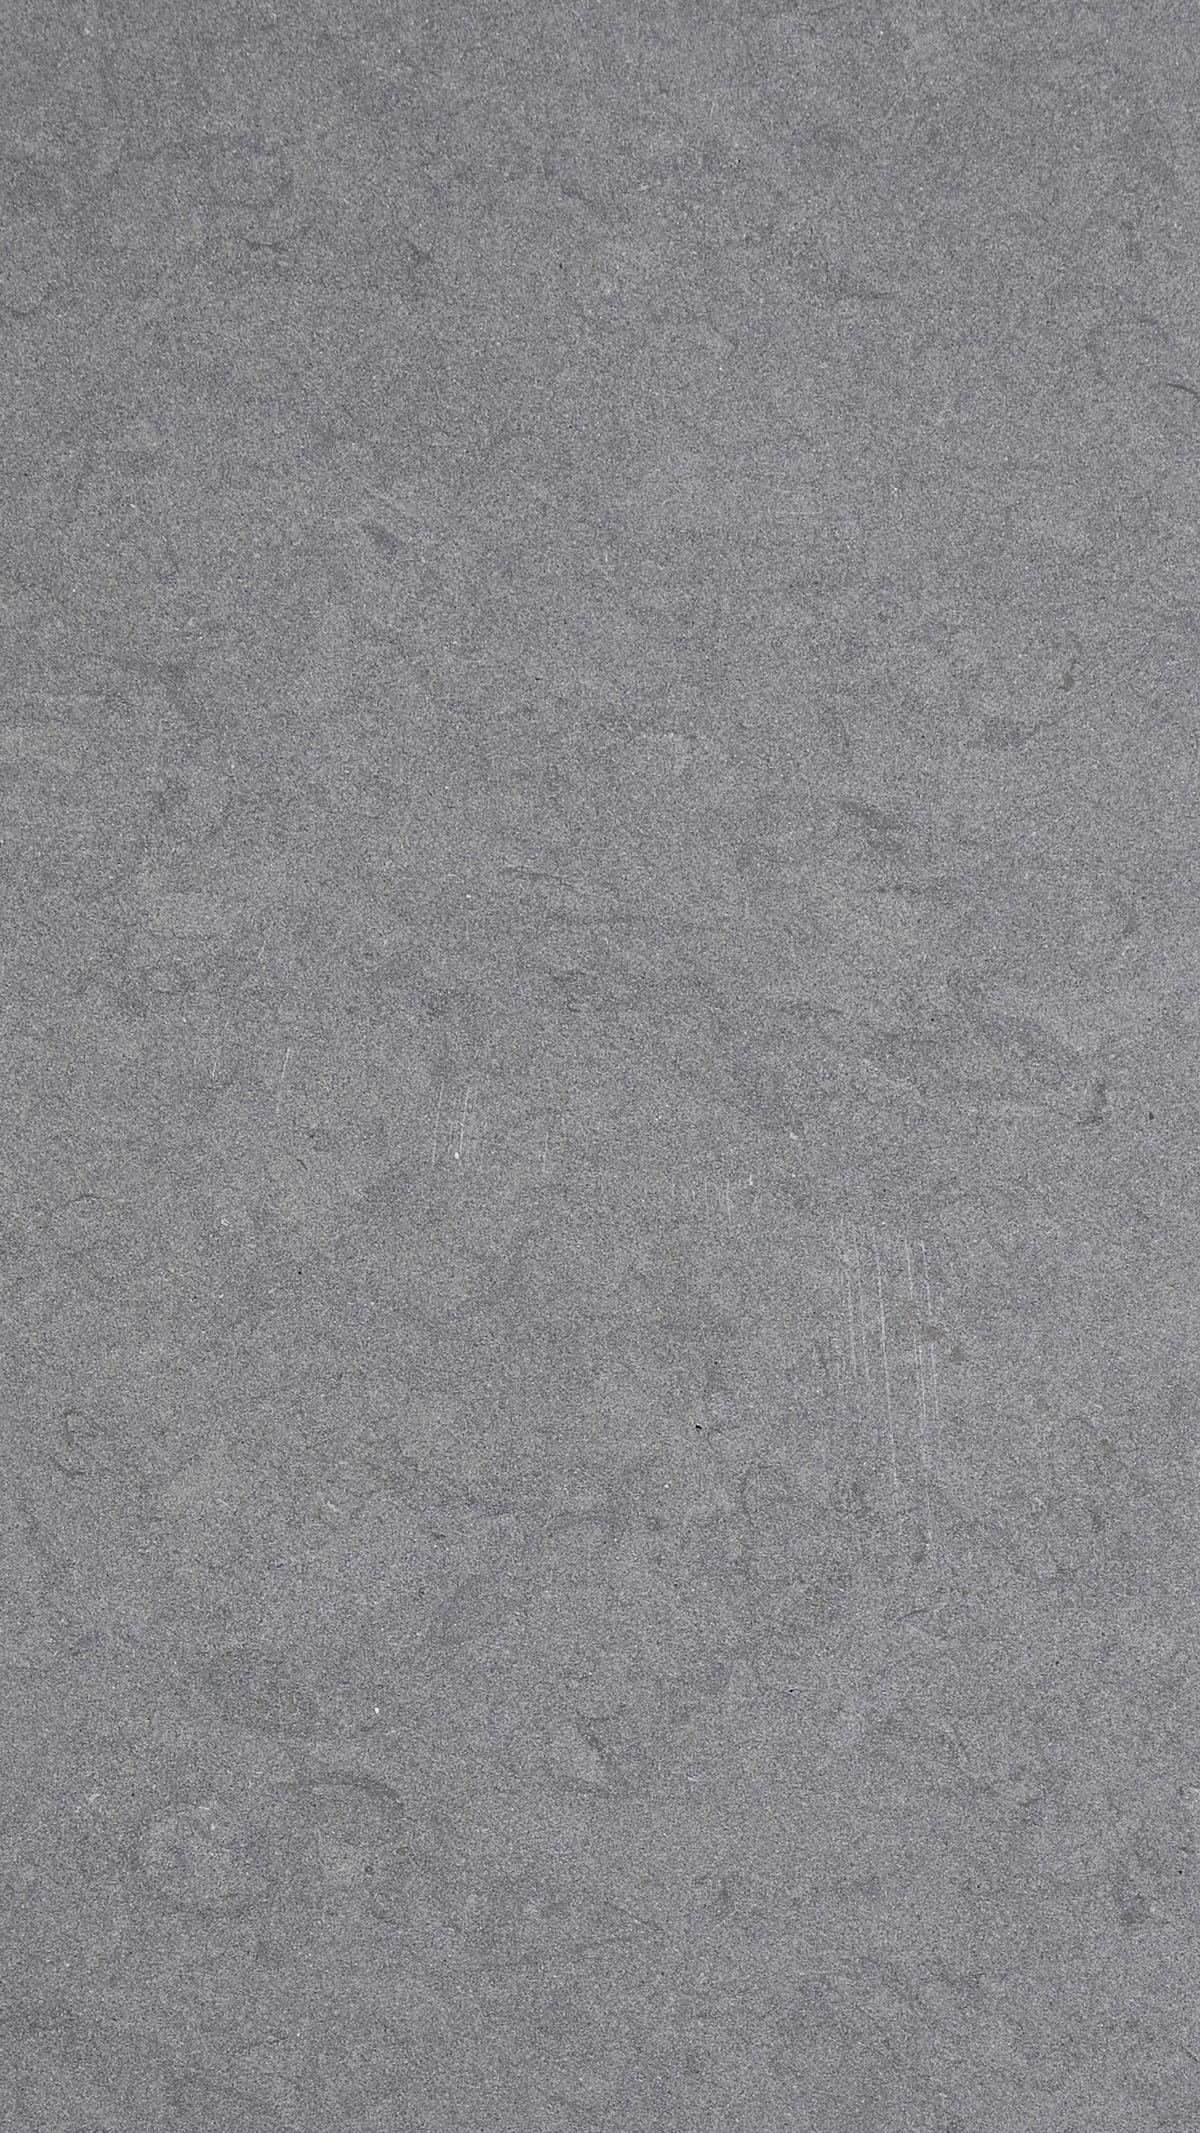 Azul Bateige Limestone